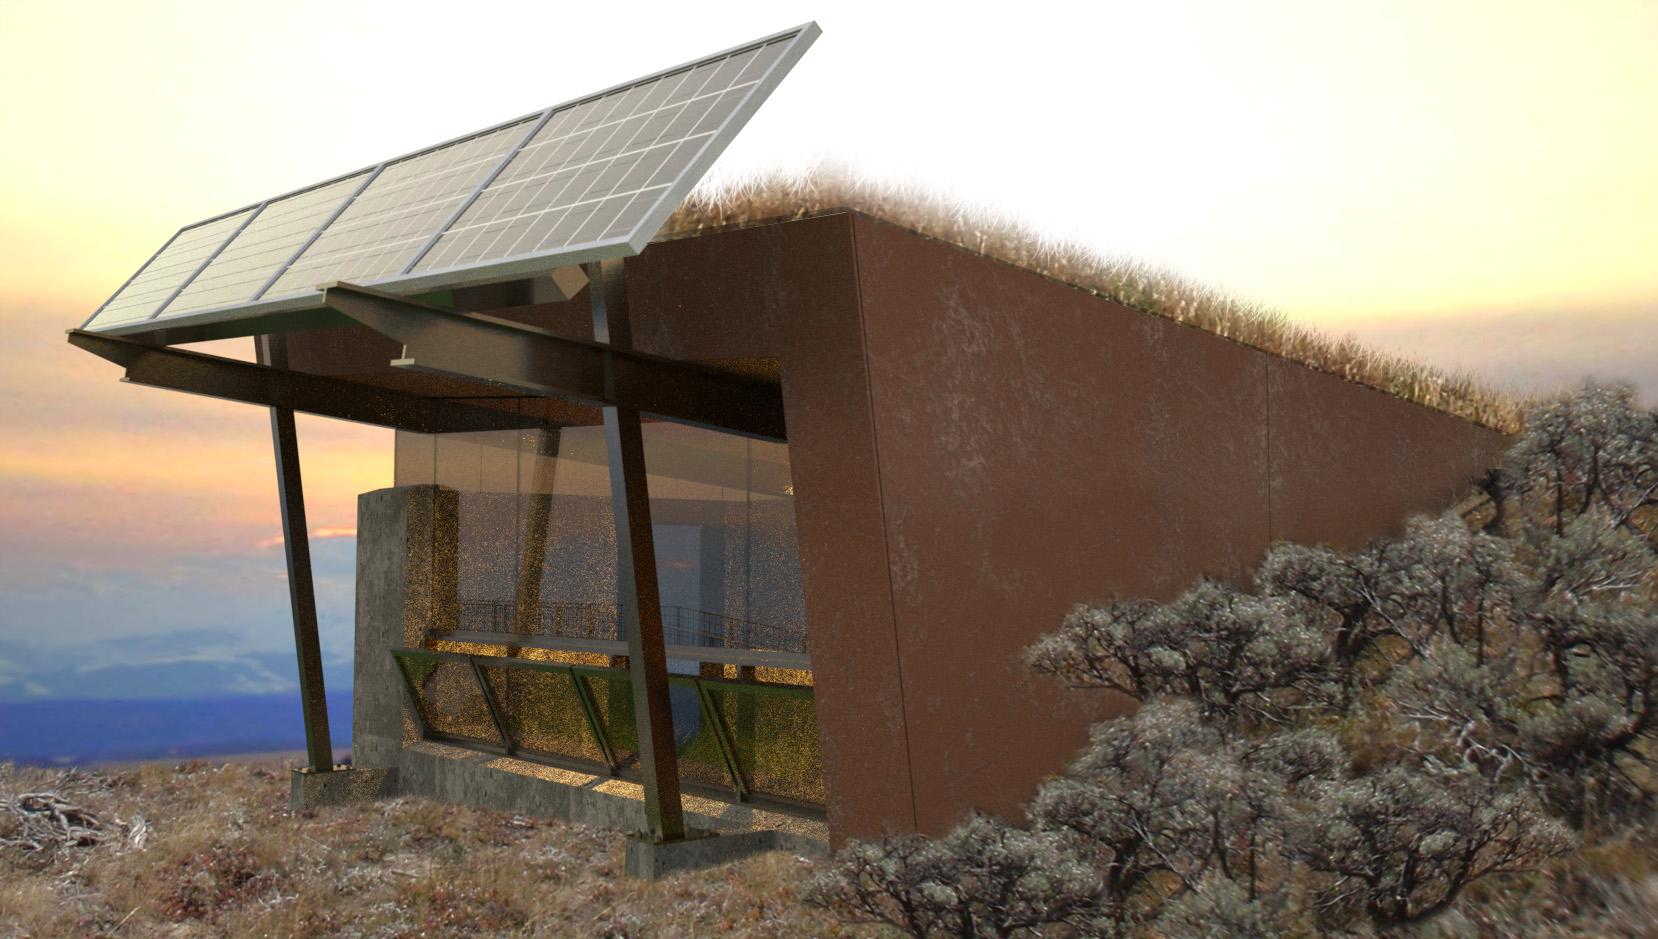 Passive Solar Atchitecture Observatory - 10.jpg